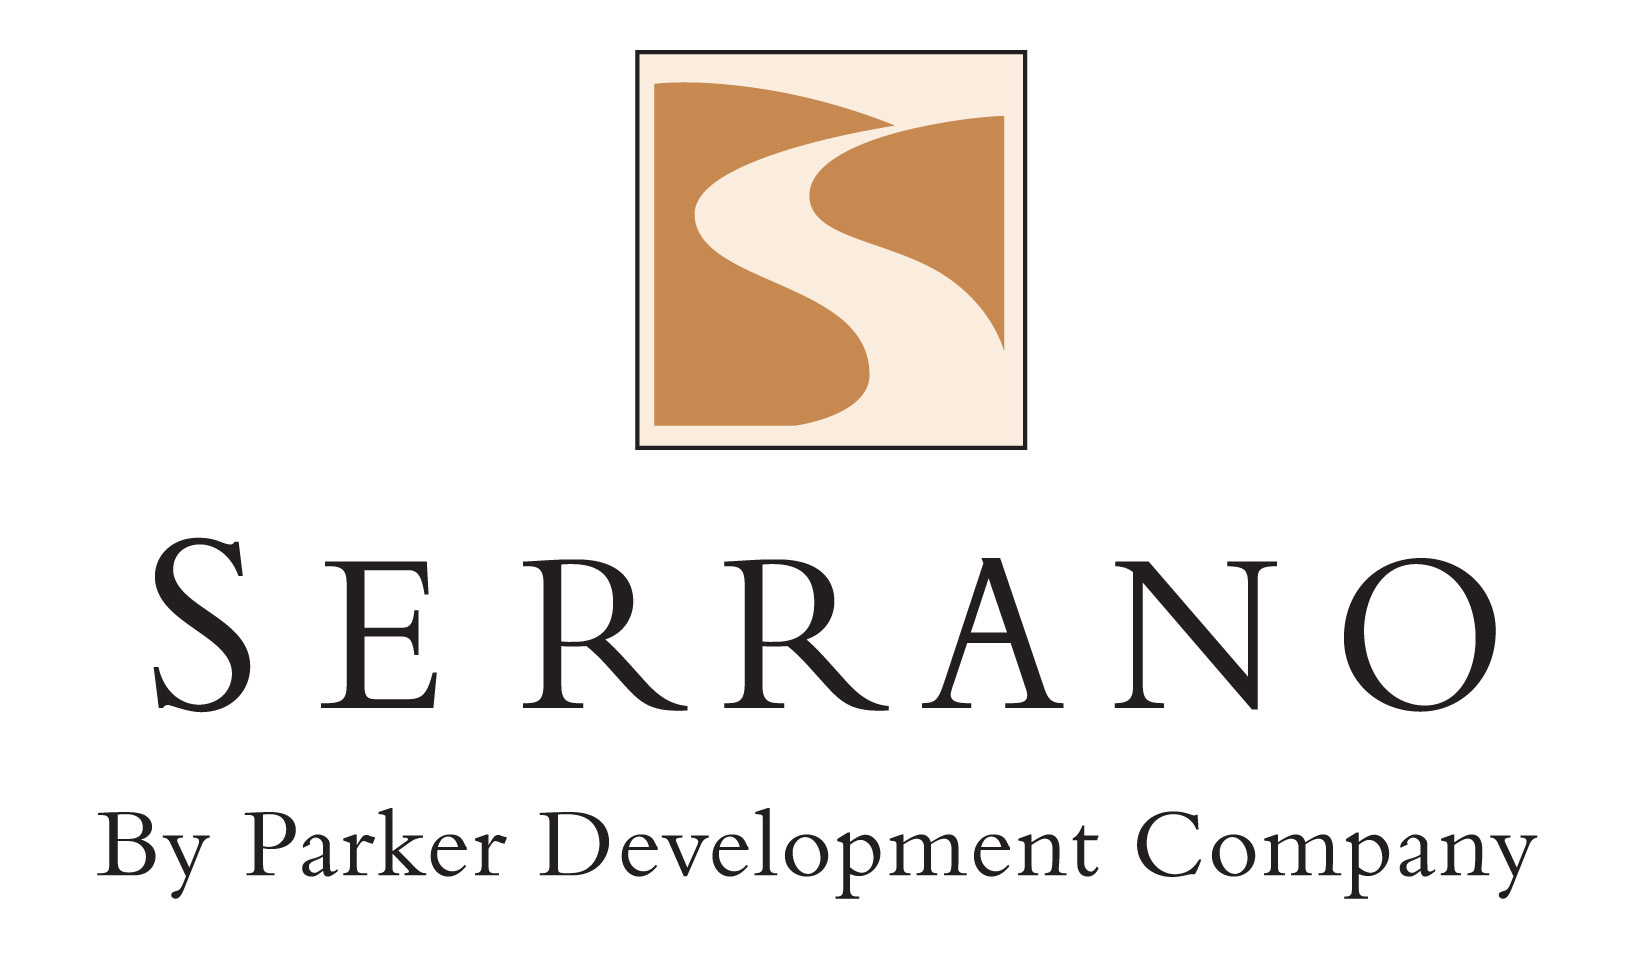 SerranobyPDC-logo.jpg